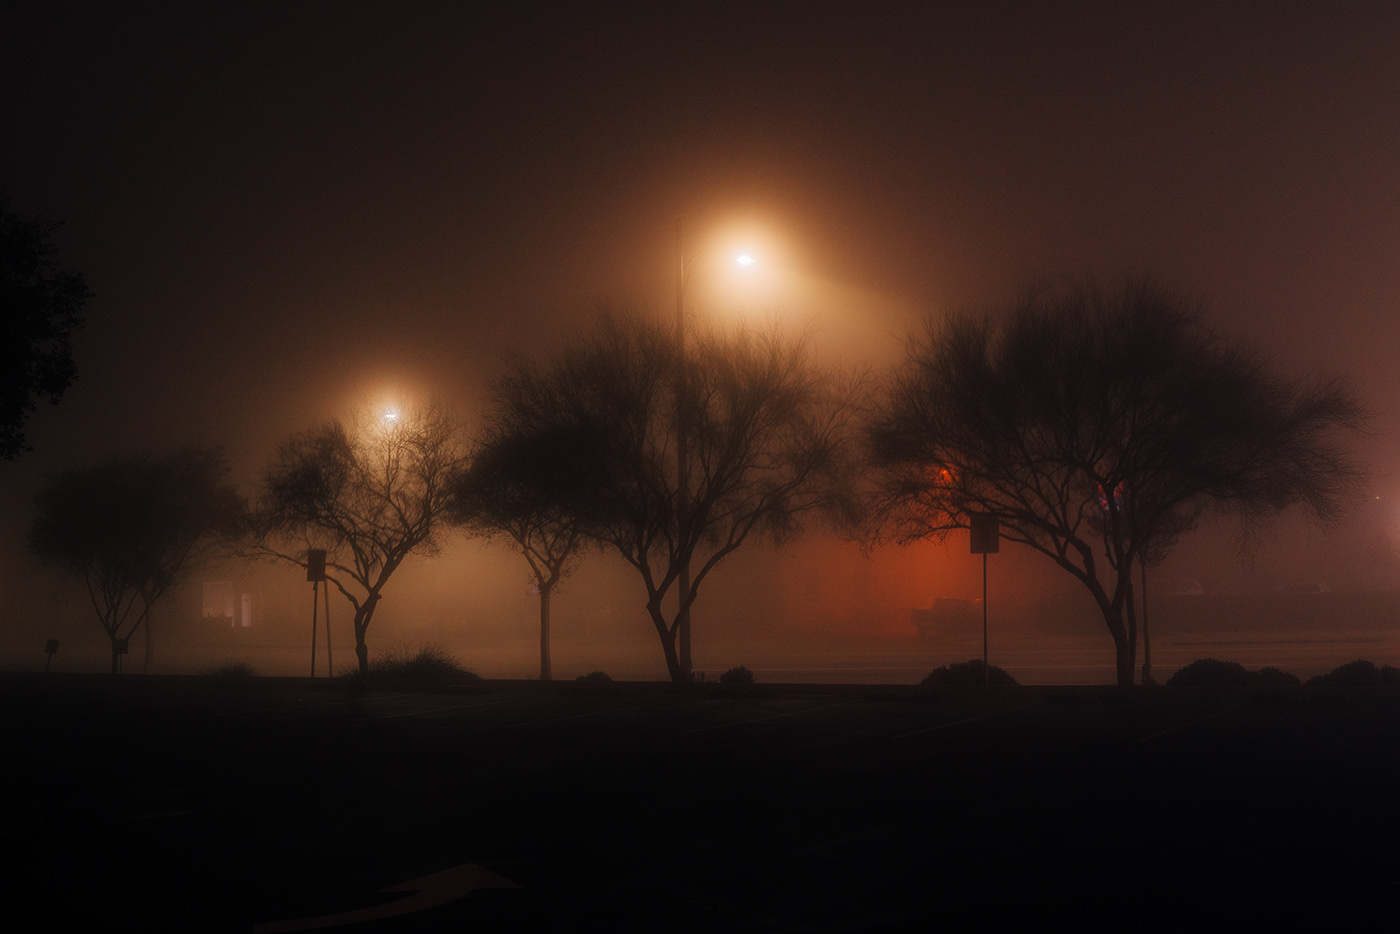 art,cinematic,cinematography,Film  ,fine art,fog,landscapes,nft,night photography,Ominous